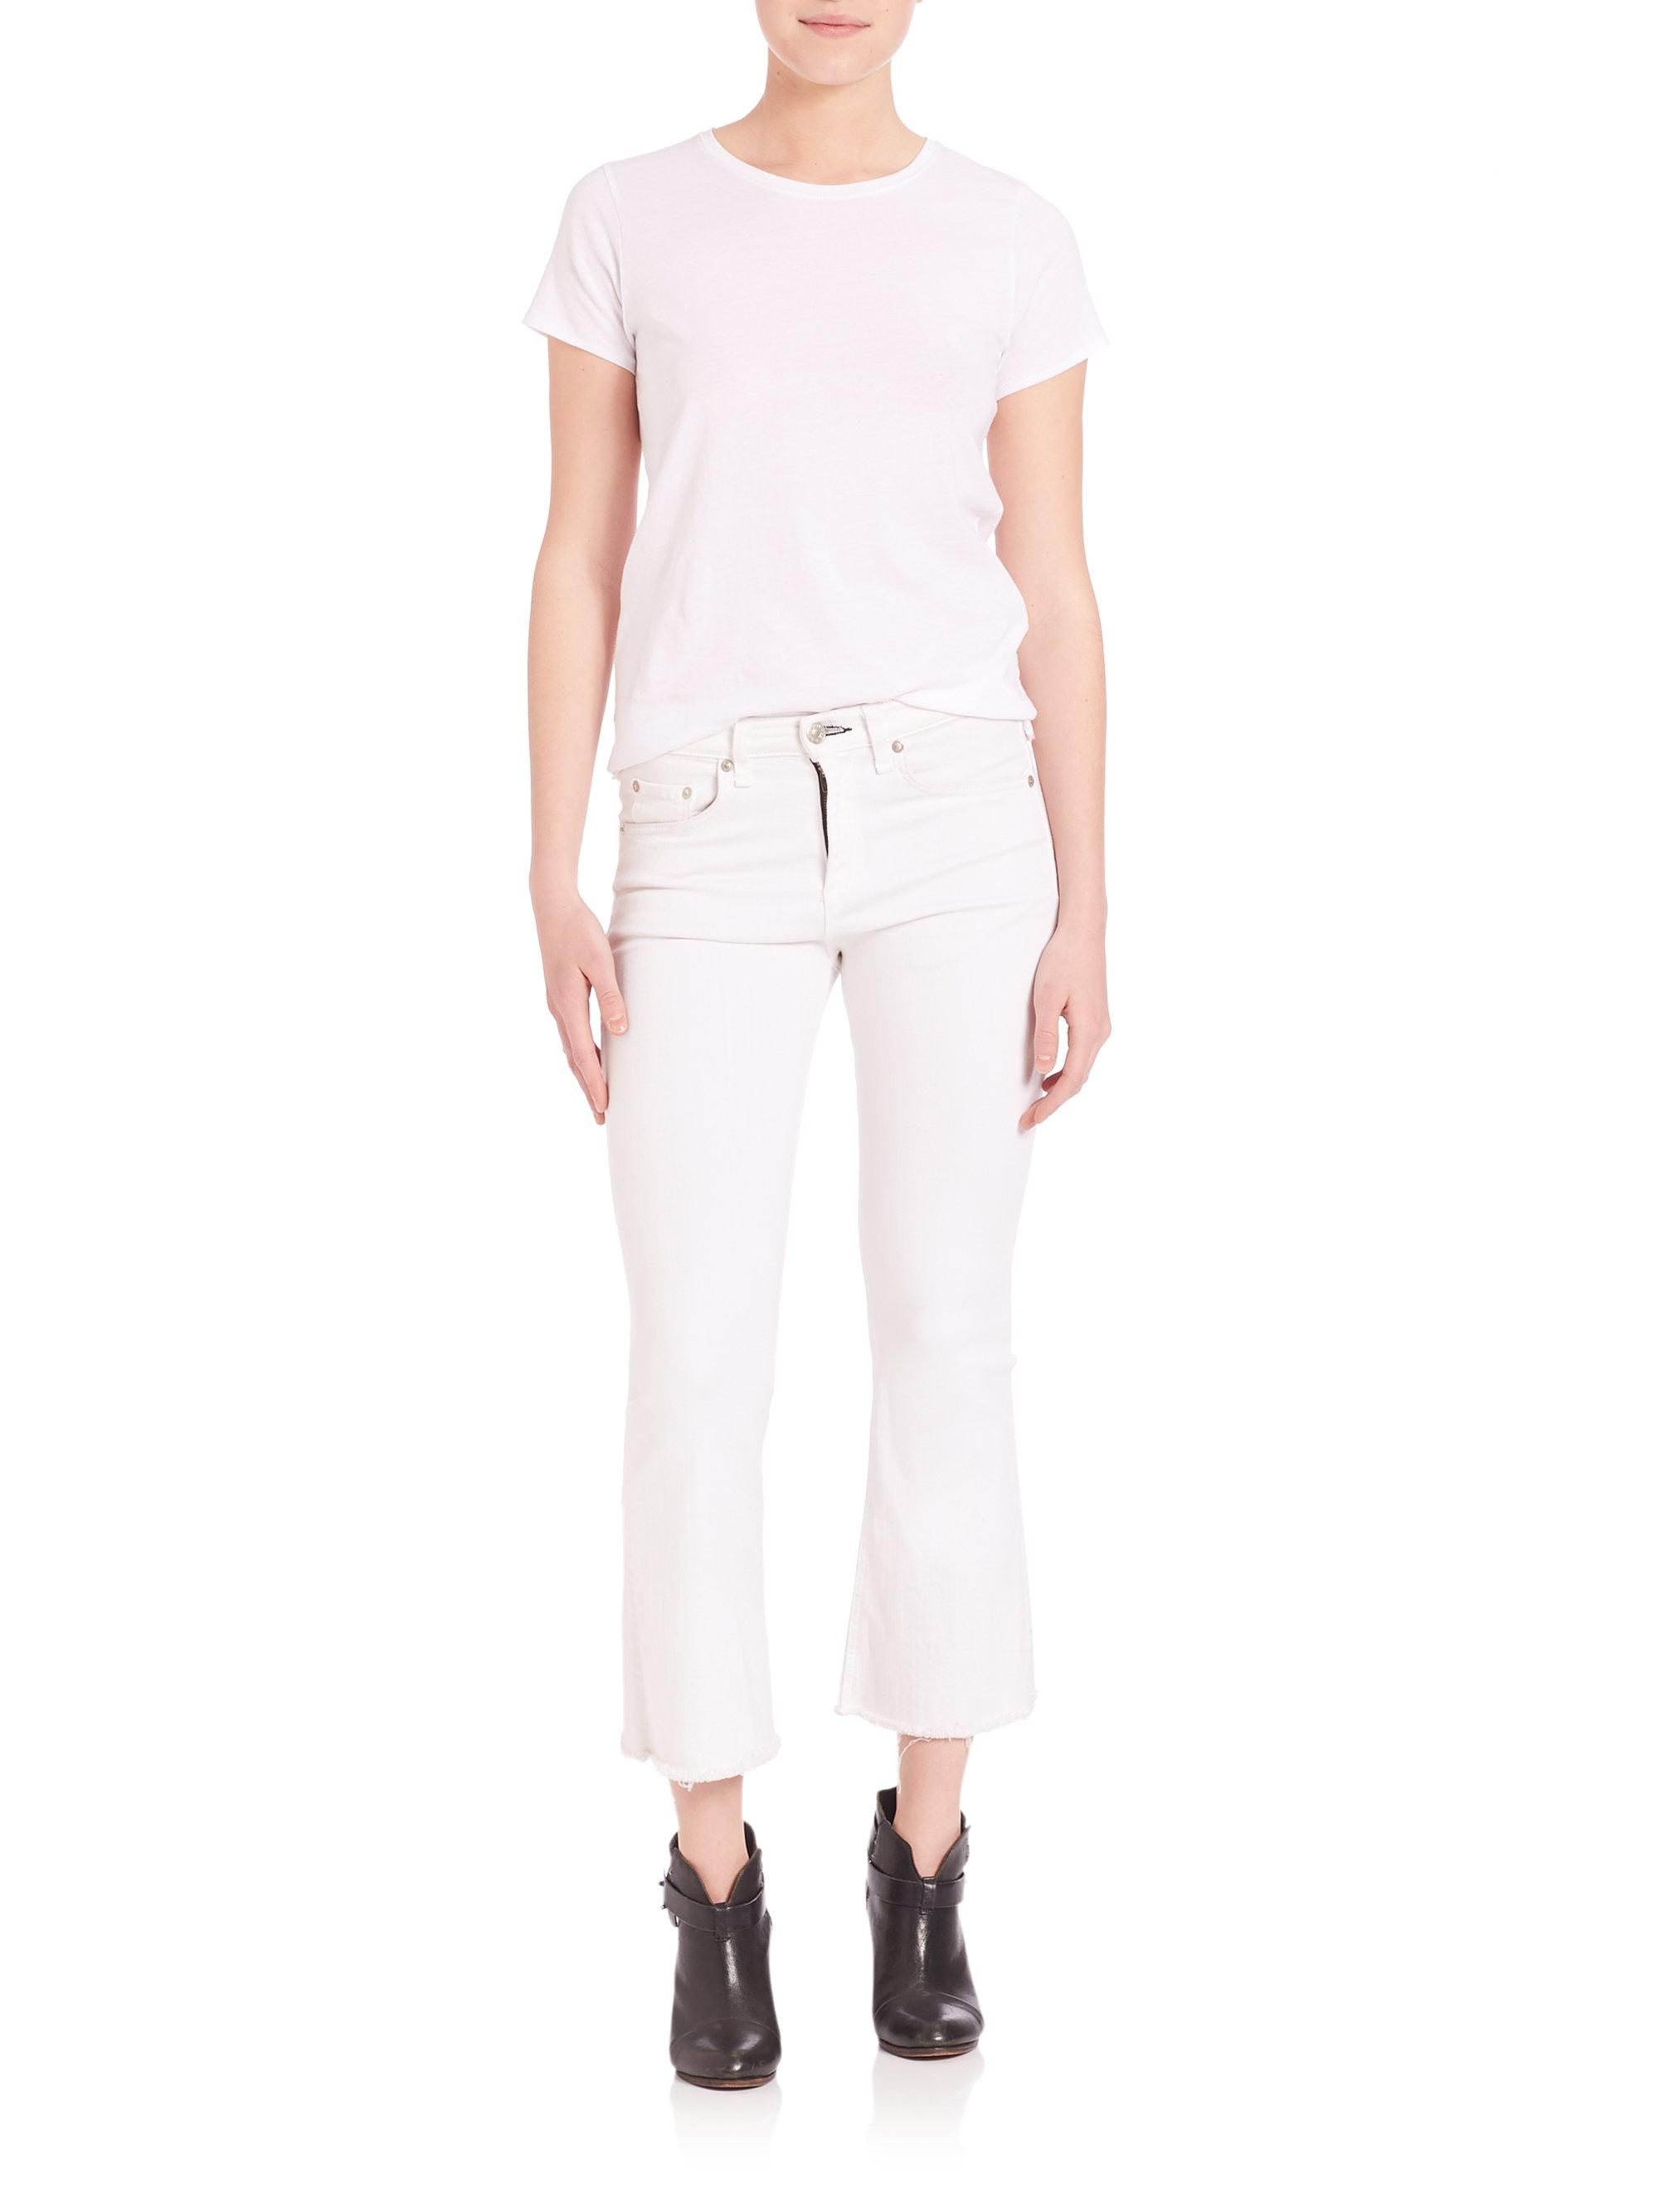 Rag & bone Cropped Released-hem Flare Jeans in White | Lyst